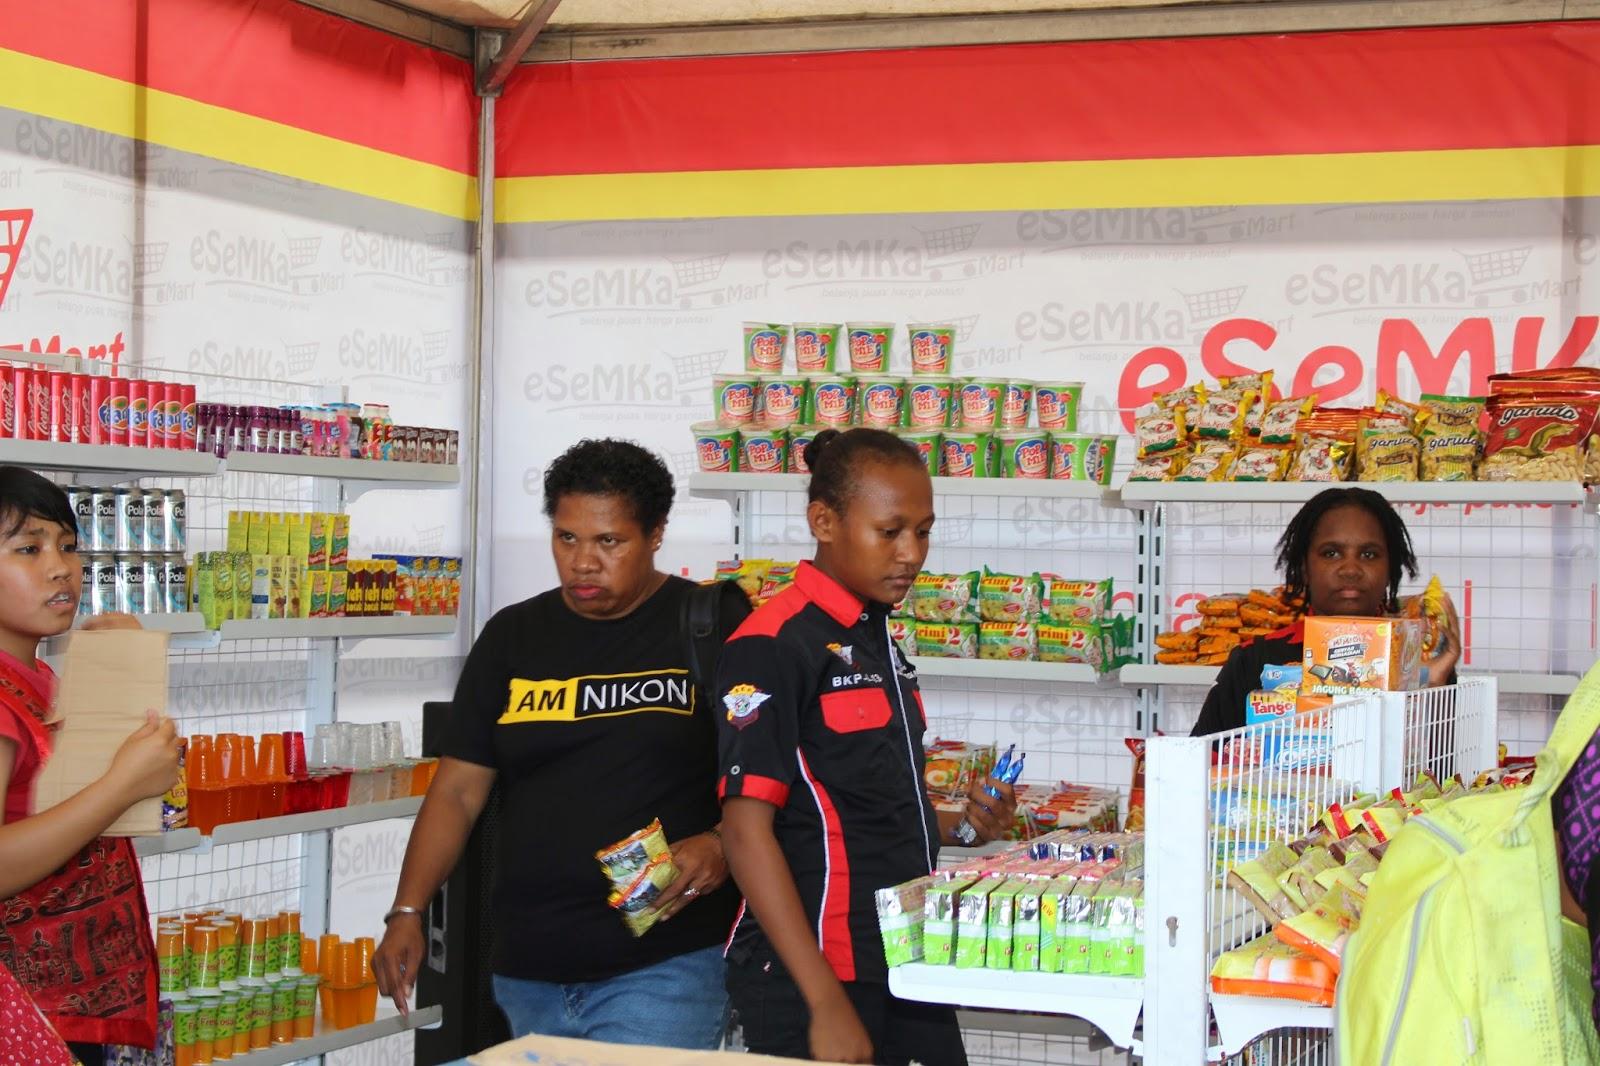 SMKN 2 Kota Jayapura Resmikan eSeMKa Mart